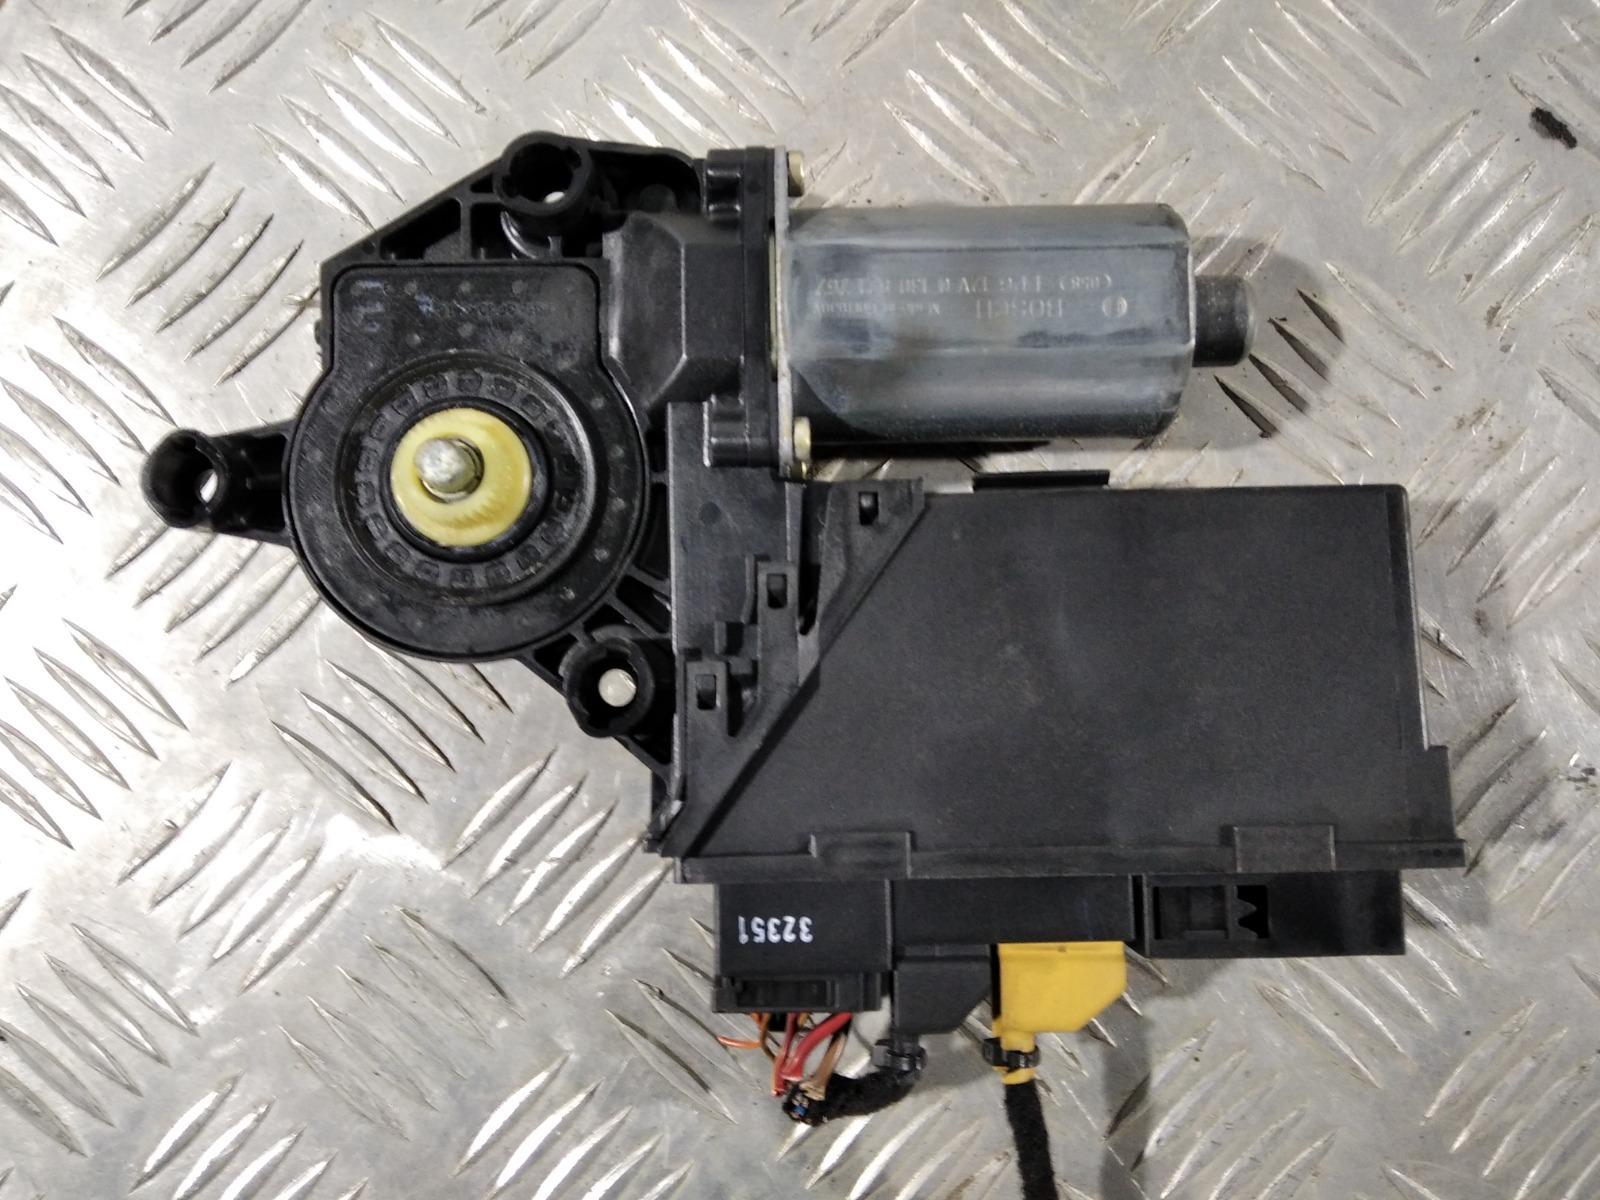 Моторчик стеклоподъемника задний левый Audi A4 B6 1.9 TDI 2003 (б/у)